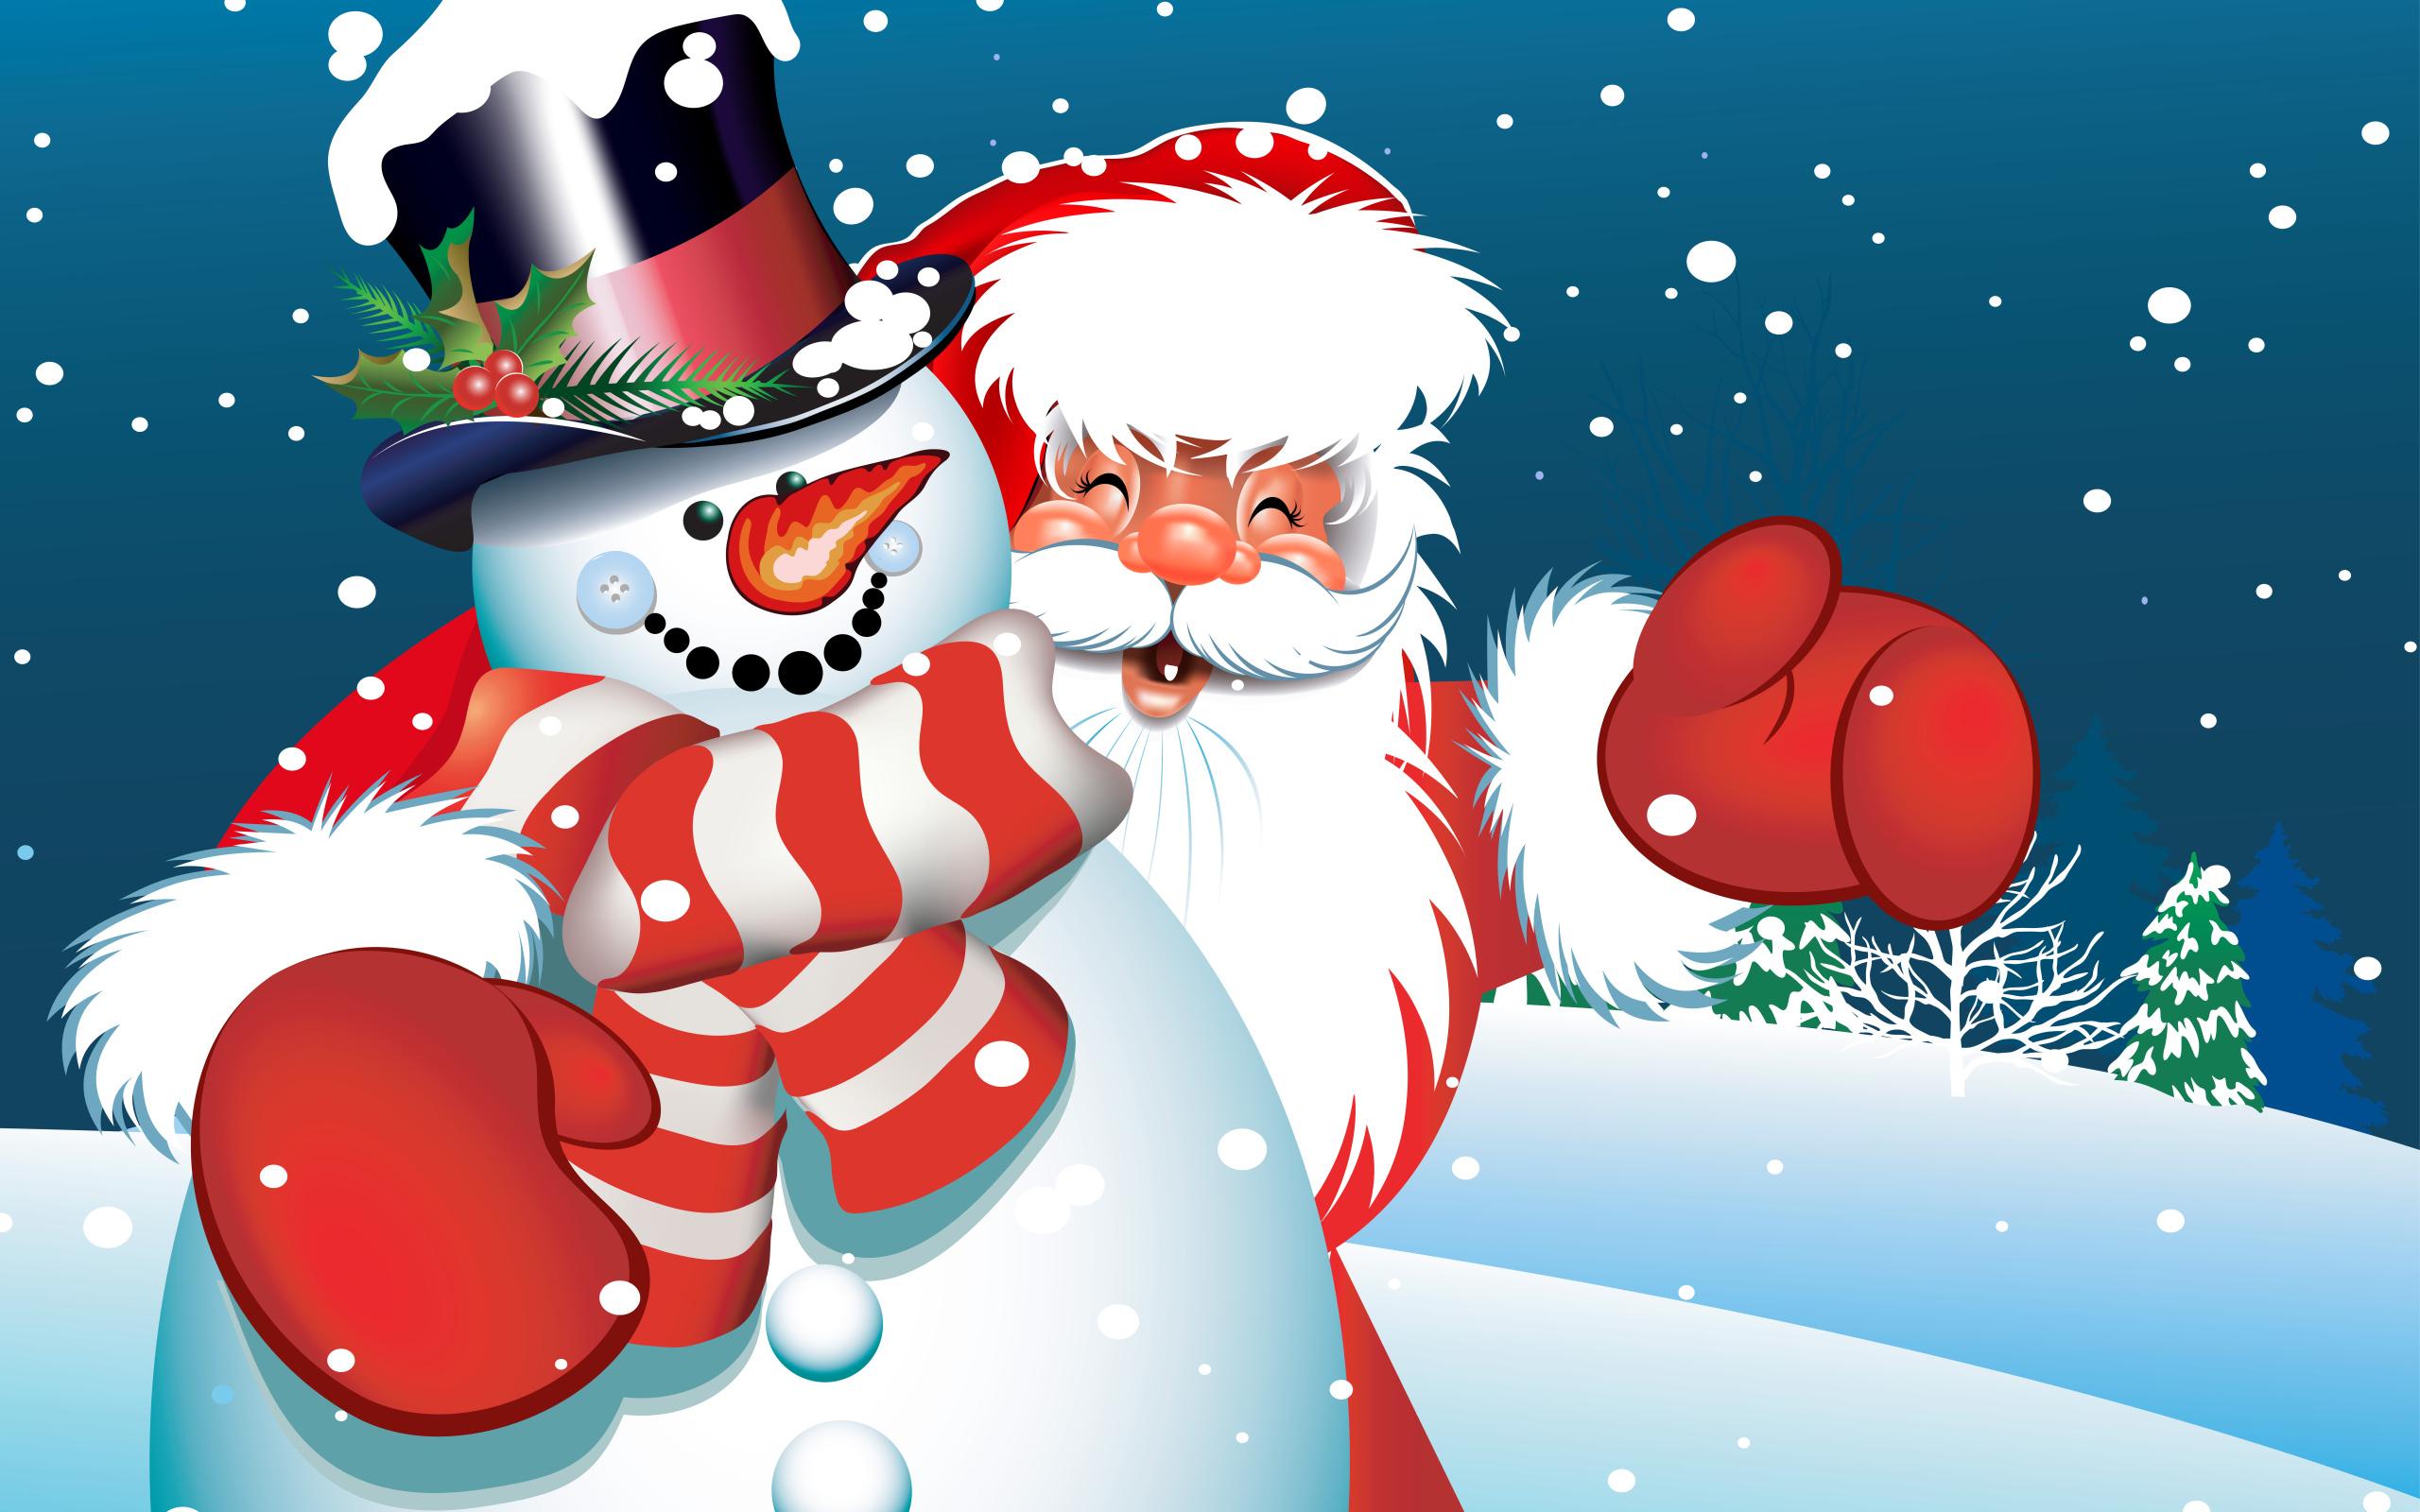 computer wallpaper santa claus face - photo #39